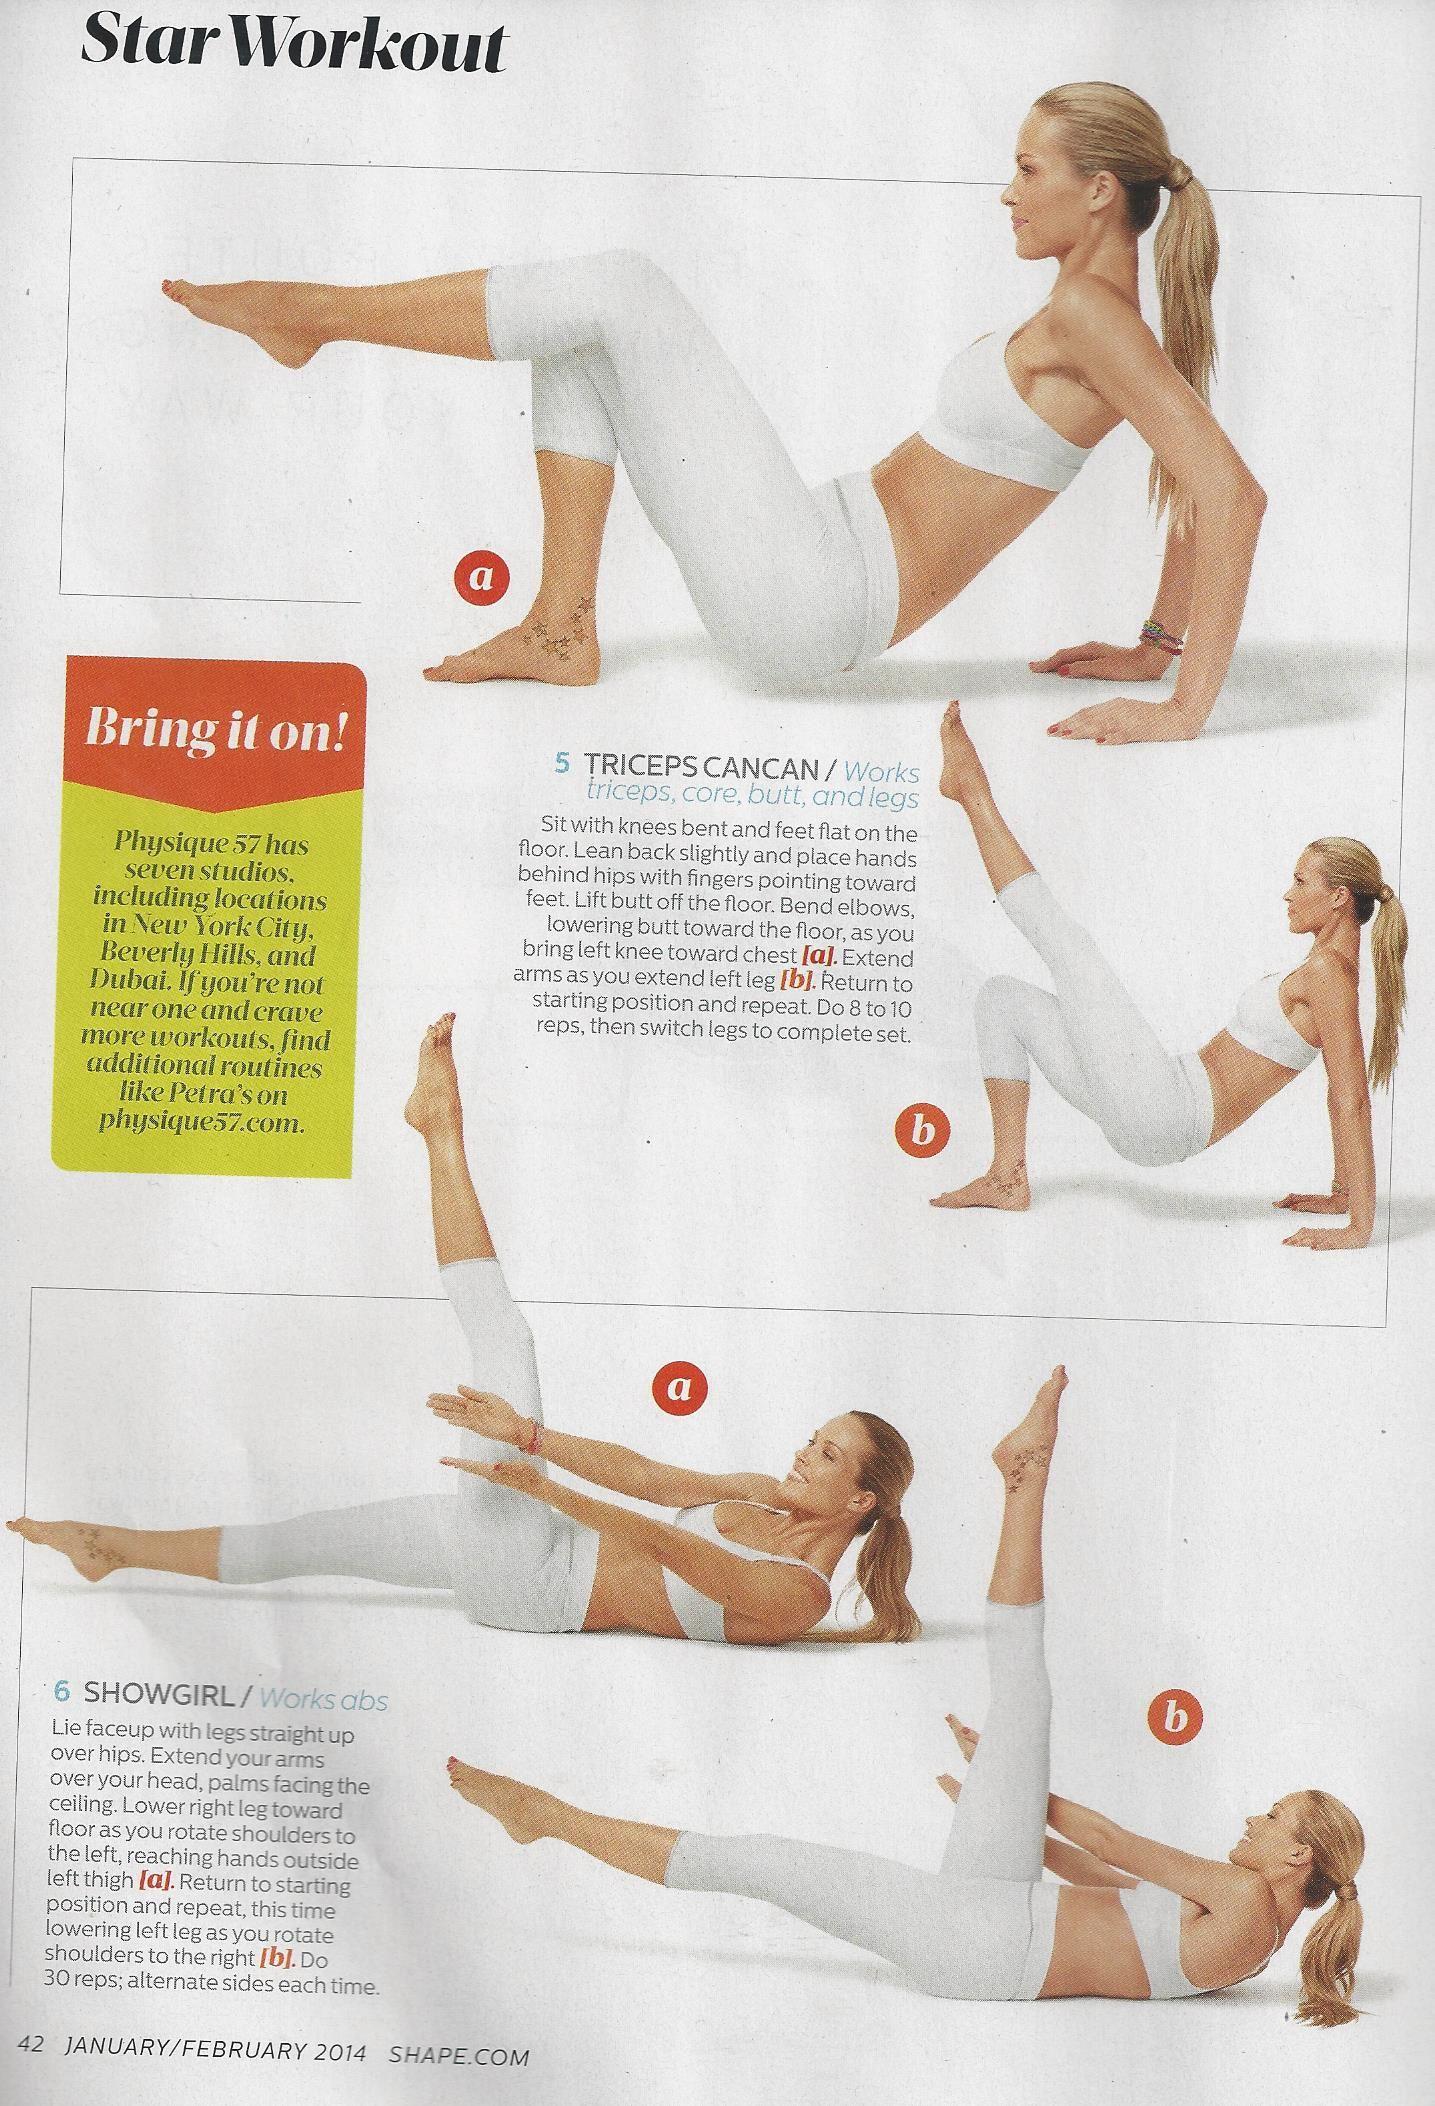 Model Petra Nemcova Physique 57 workout as seen in Shape